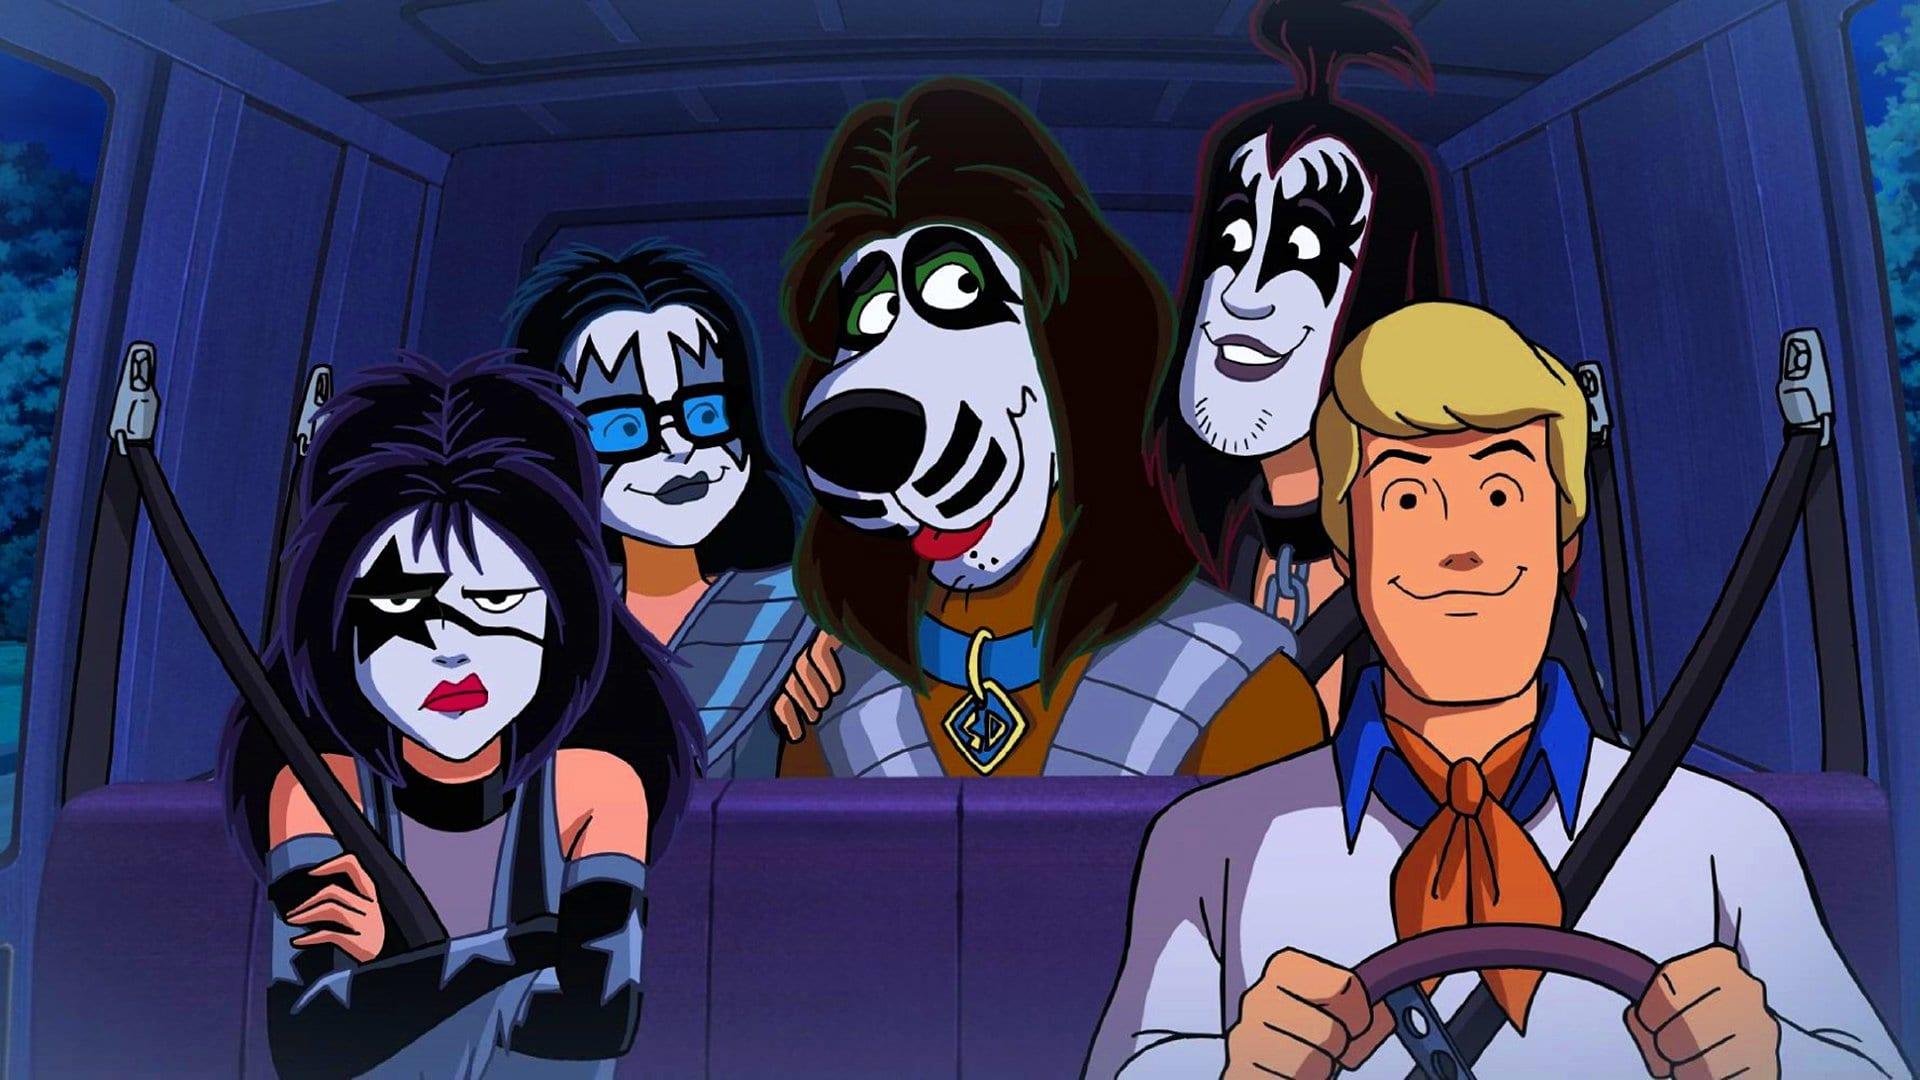 Regarder Scooby-Doo! rencontre avec KISS en streaming gratuit